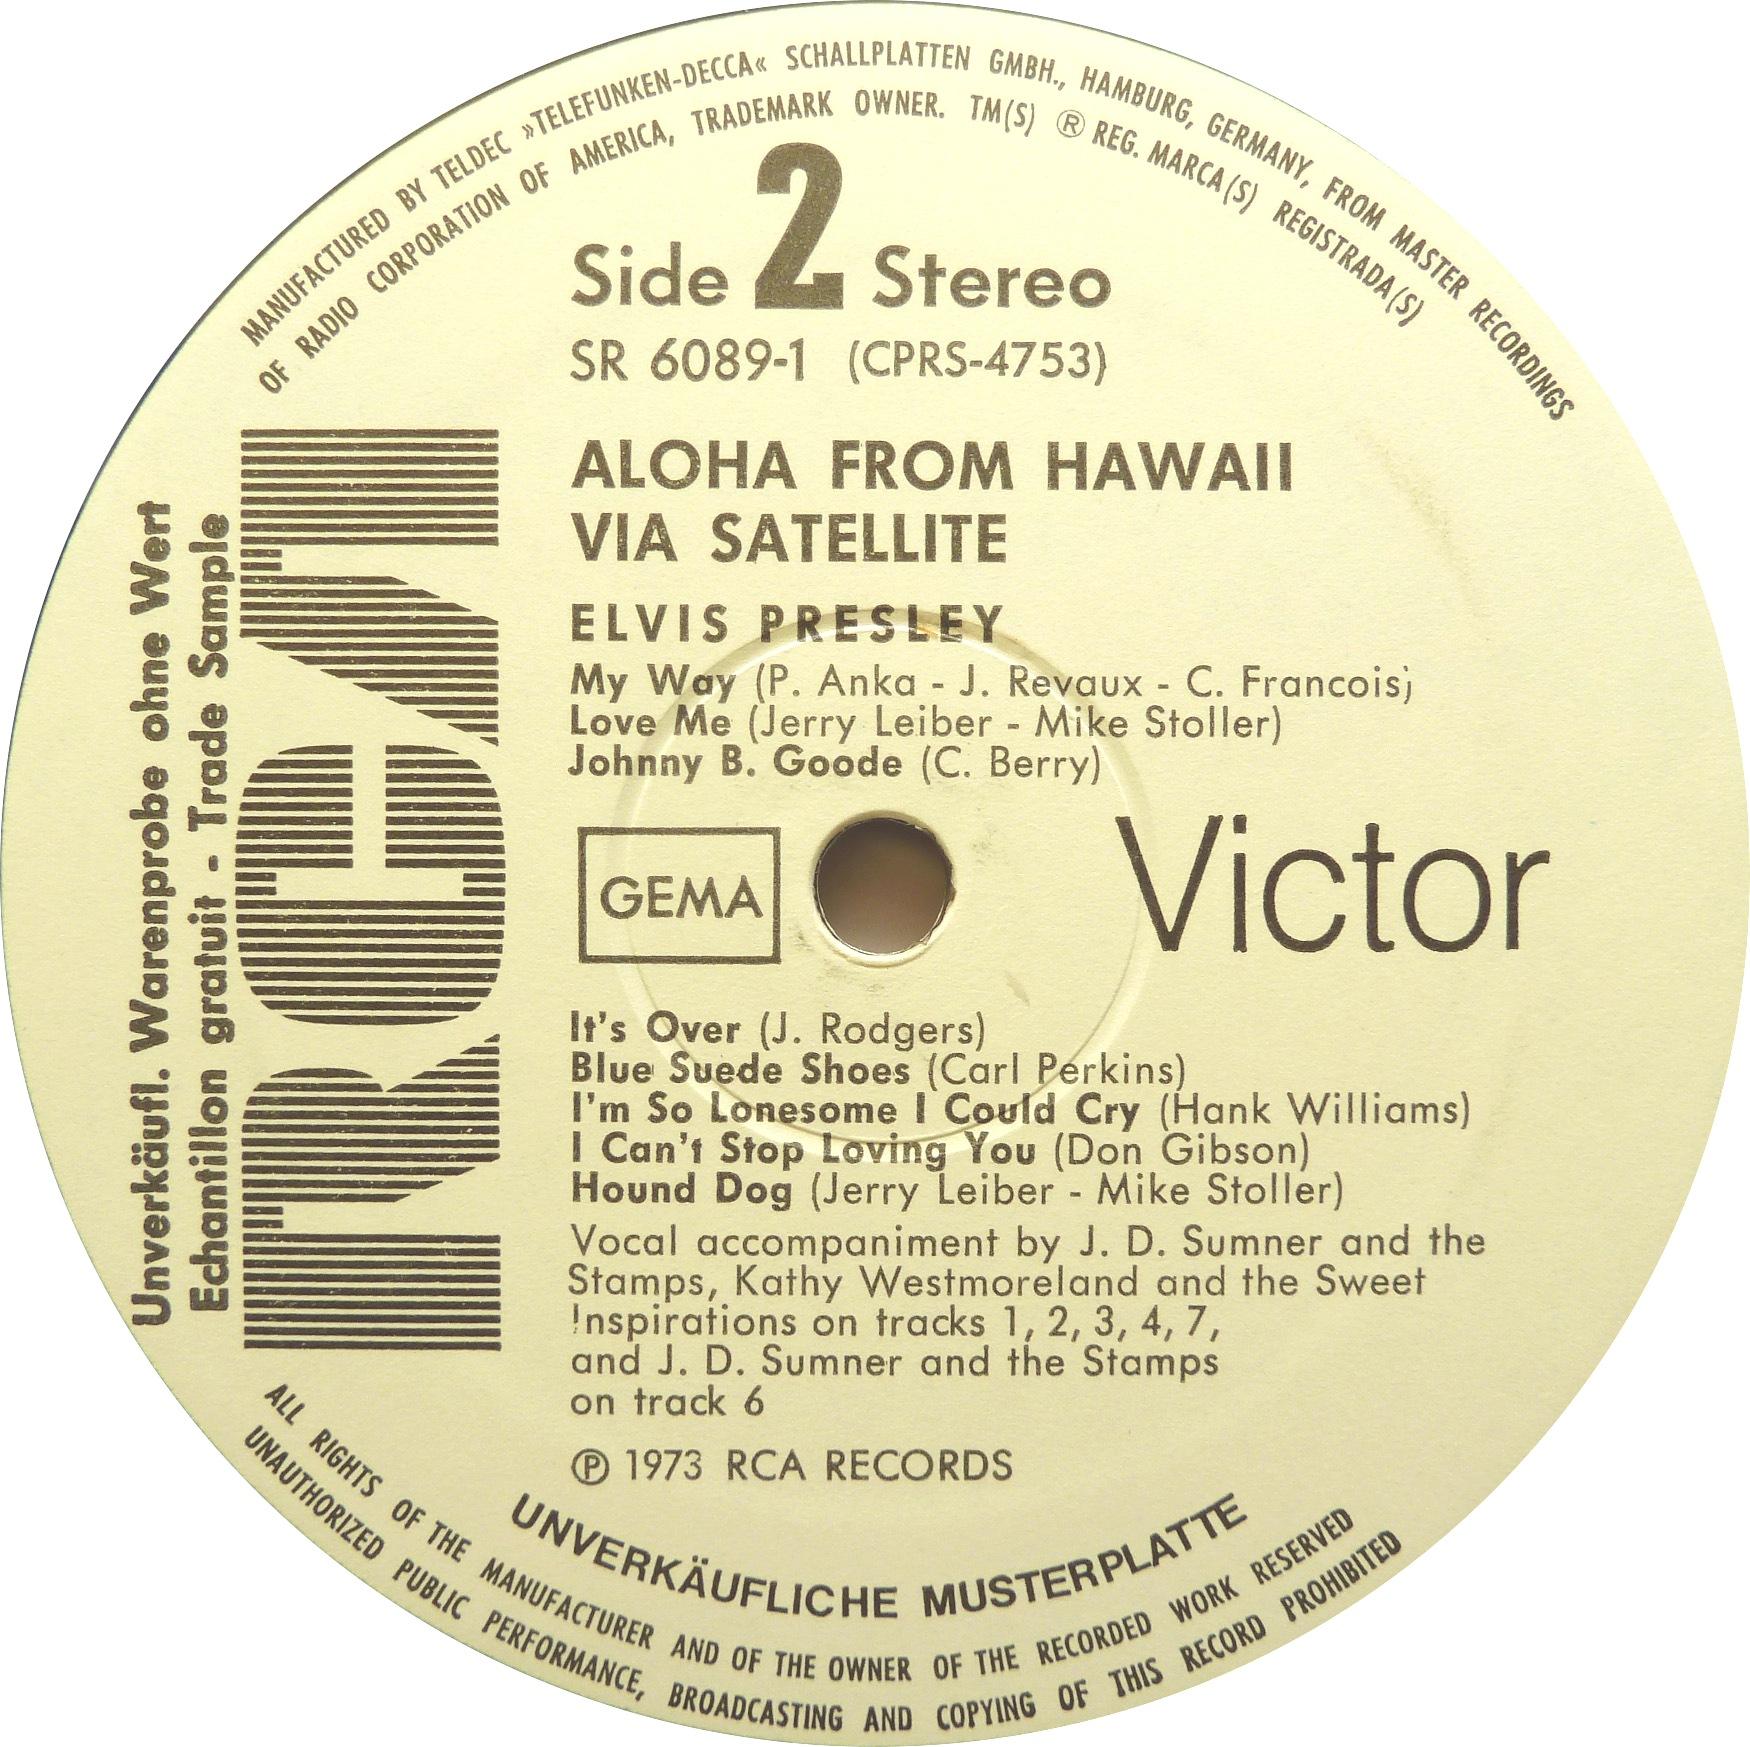 ALOHA FROM HAWAII VIA SATELLITE  Afh73promoside2gsjv5